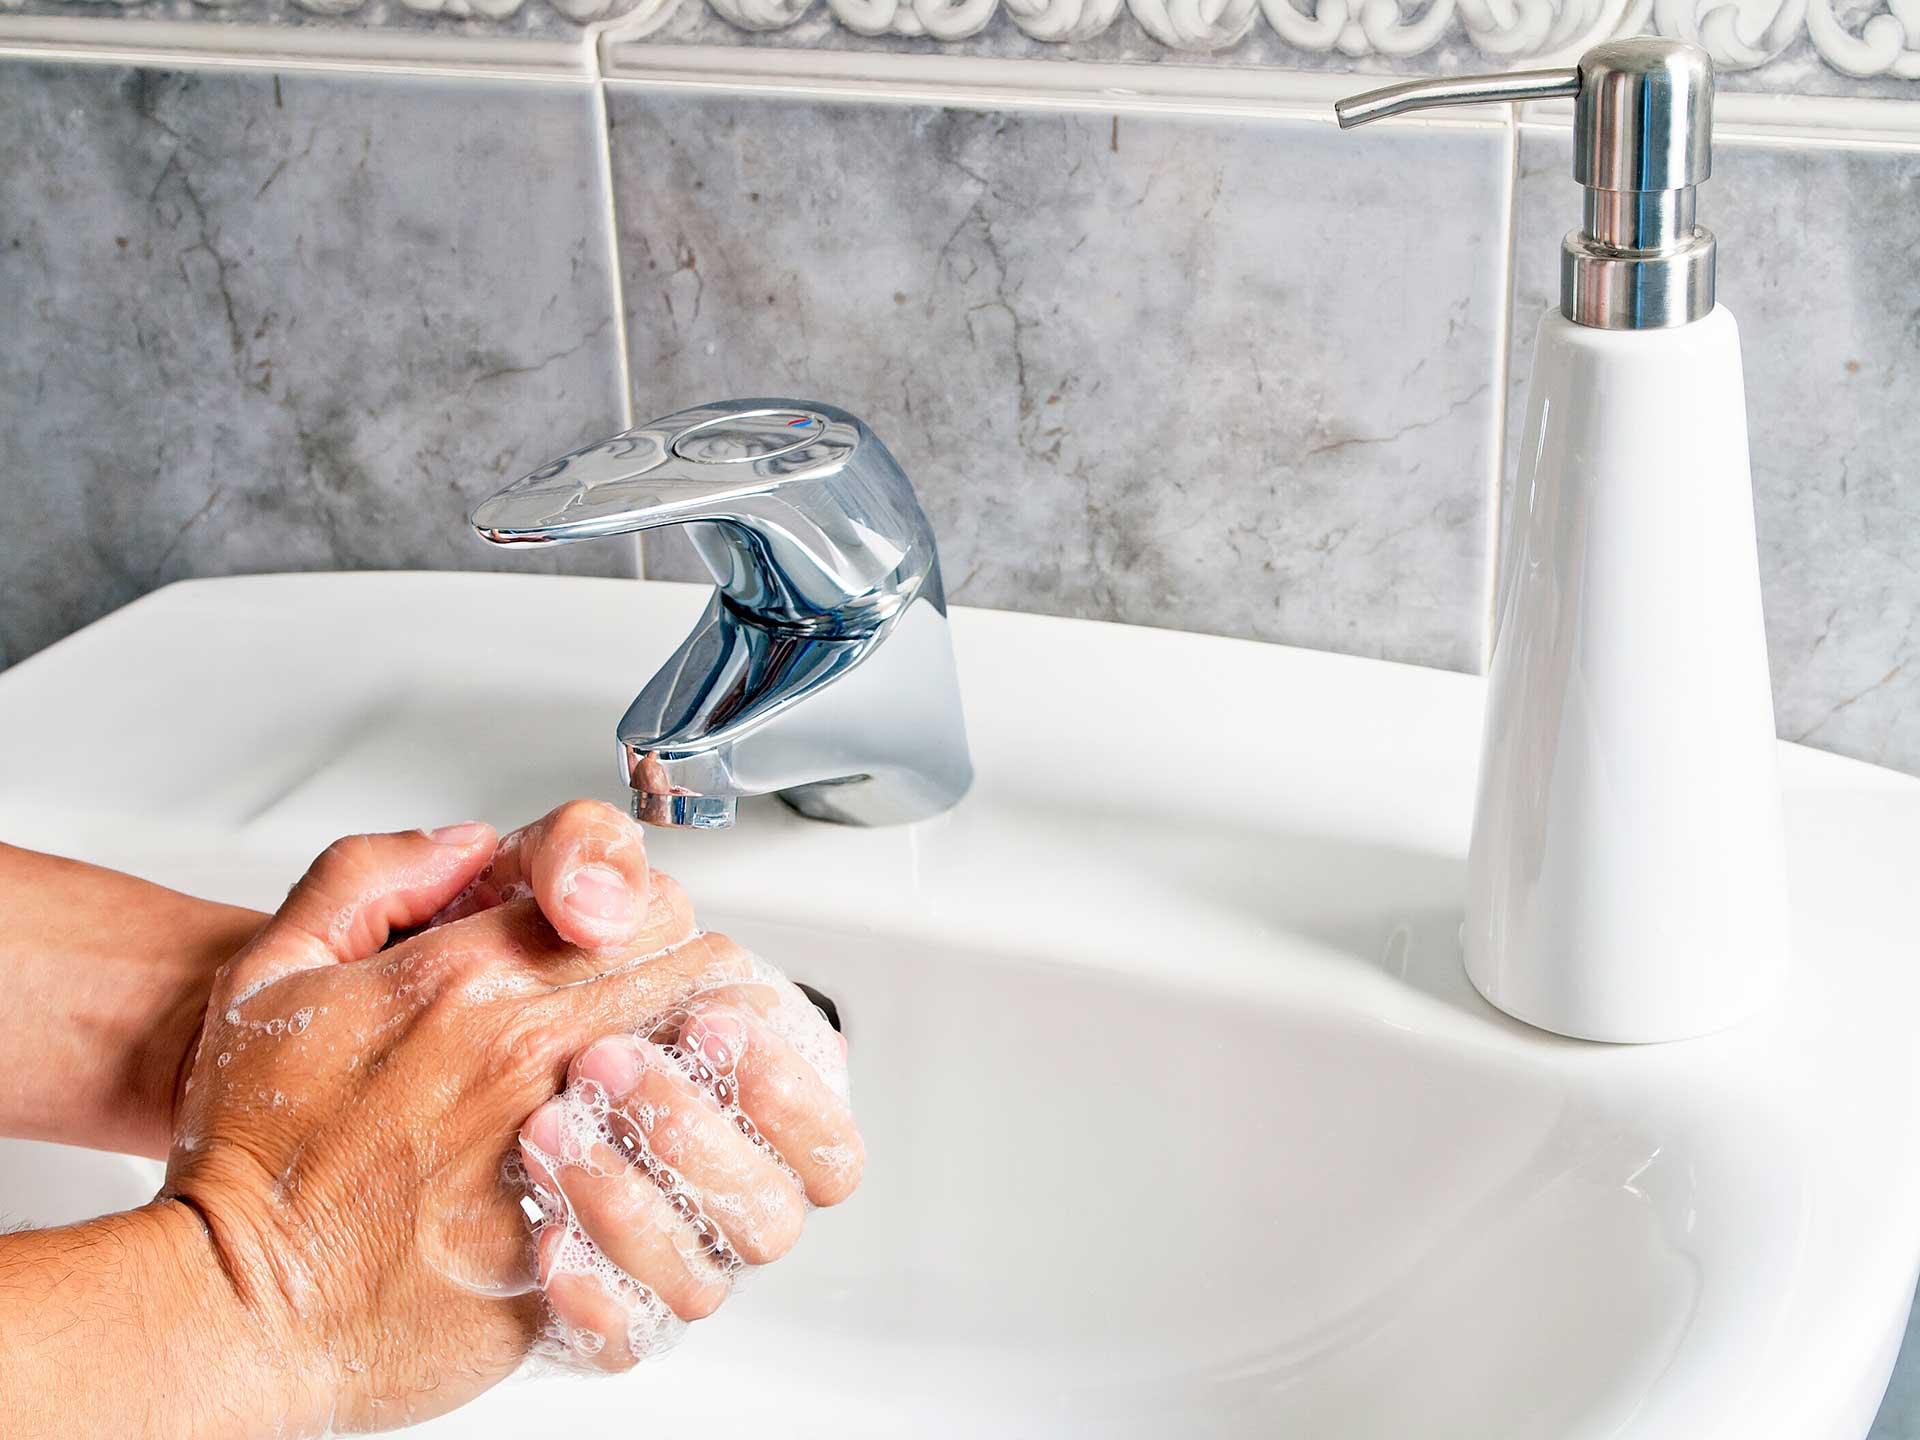 Medidas de Higiene